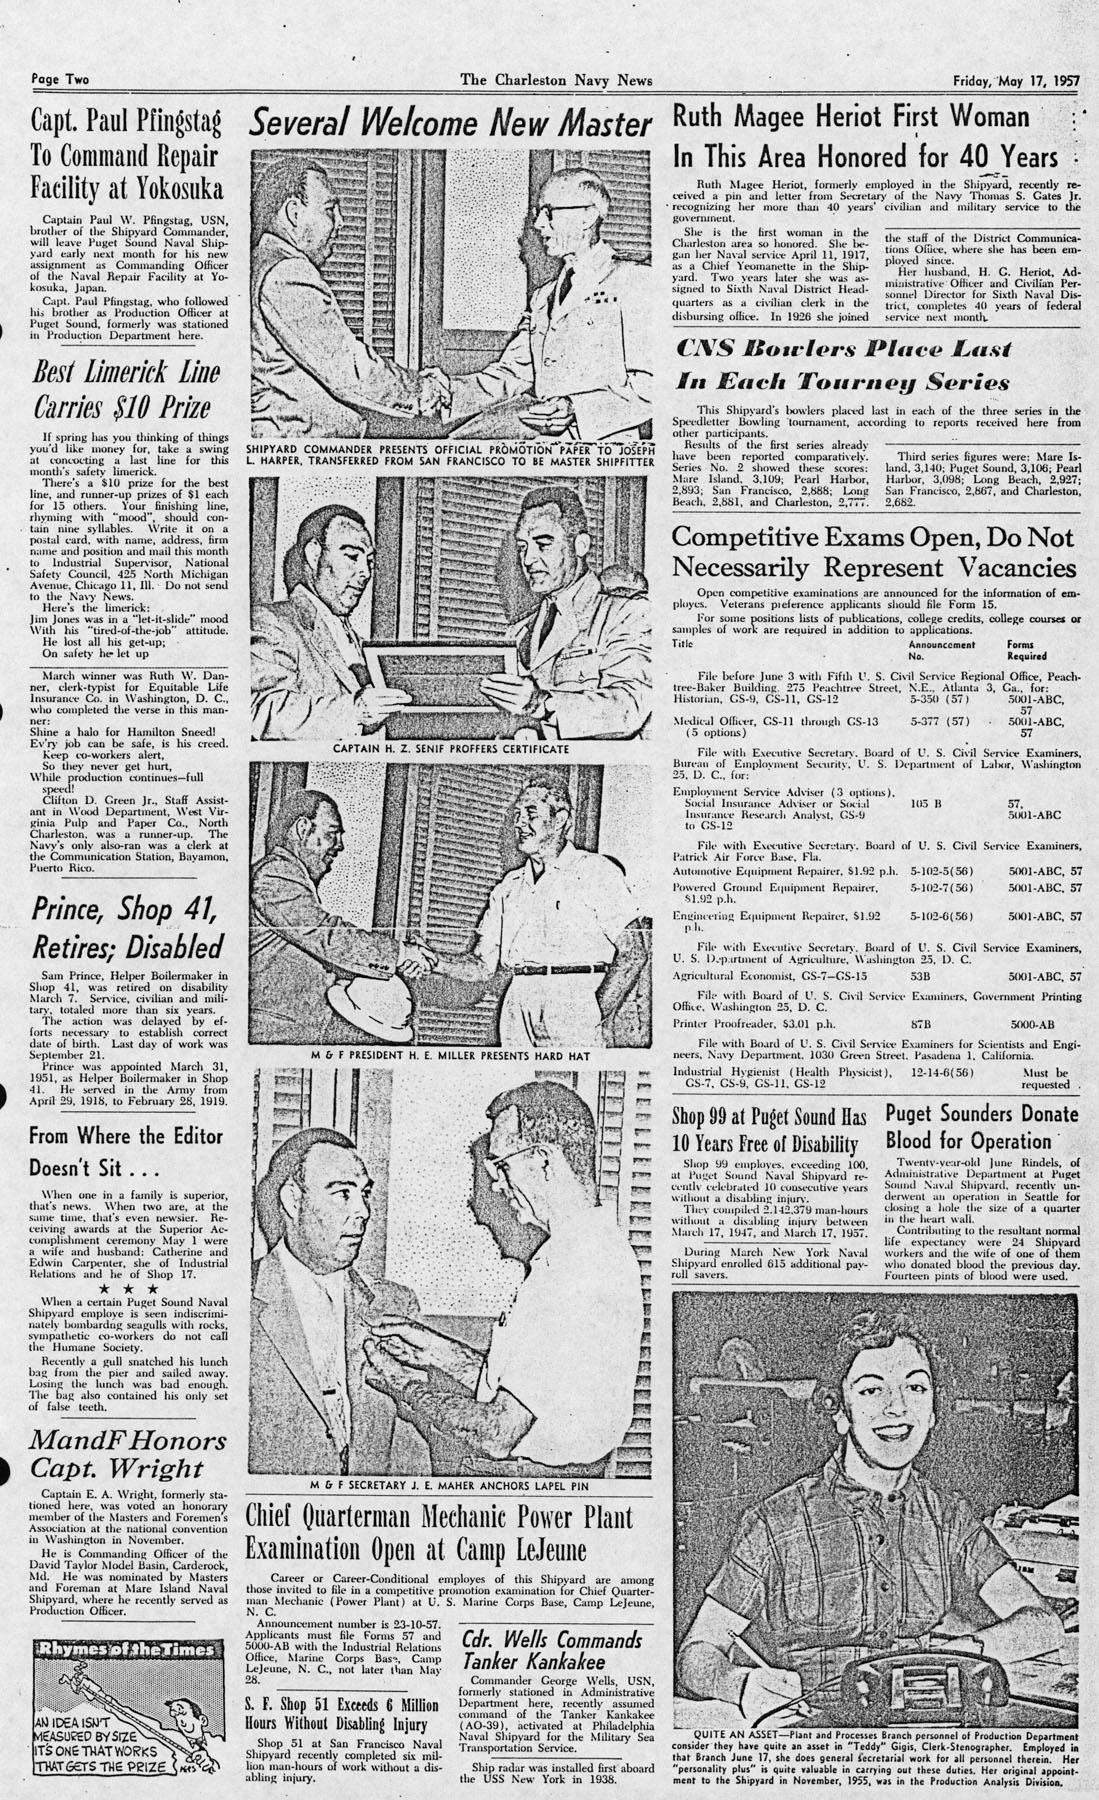 The Charleston Navy News, Volume 15, Edition 22, page ii